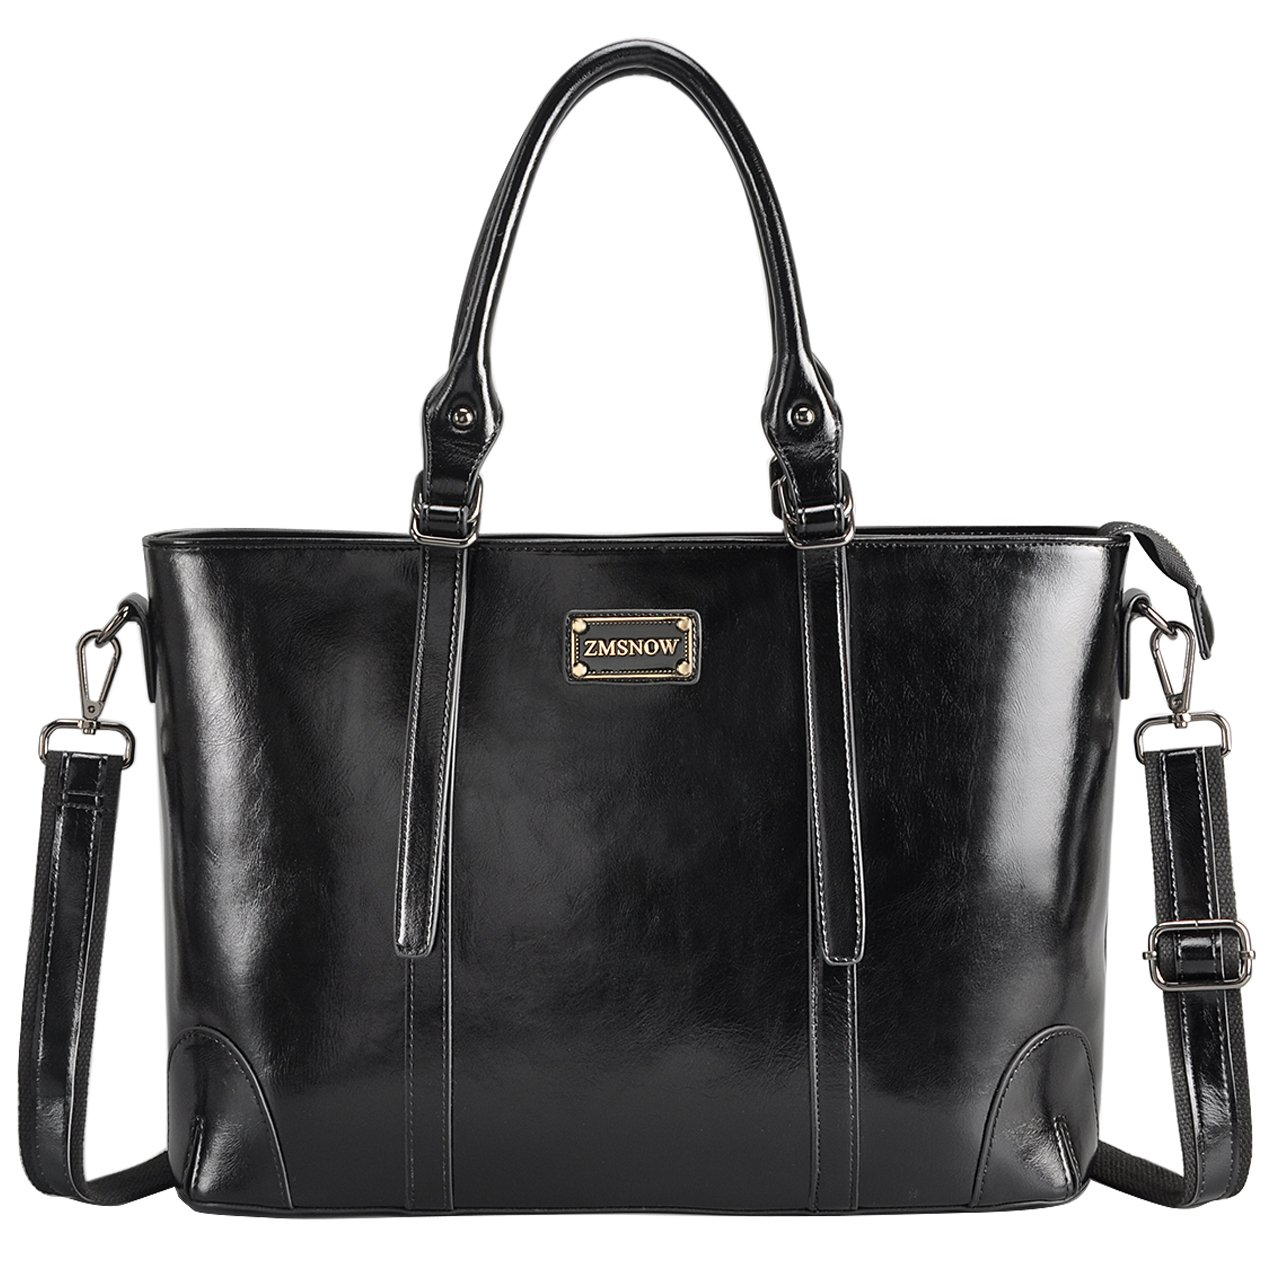 ZMSnow Laptop Bag,Elegant Tote Bag Fits up to 15.6 Inch Laptop for Women Work Business School Travel (Black)